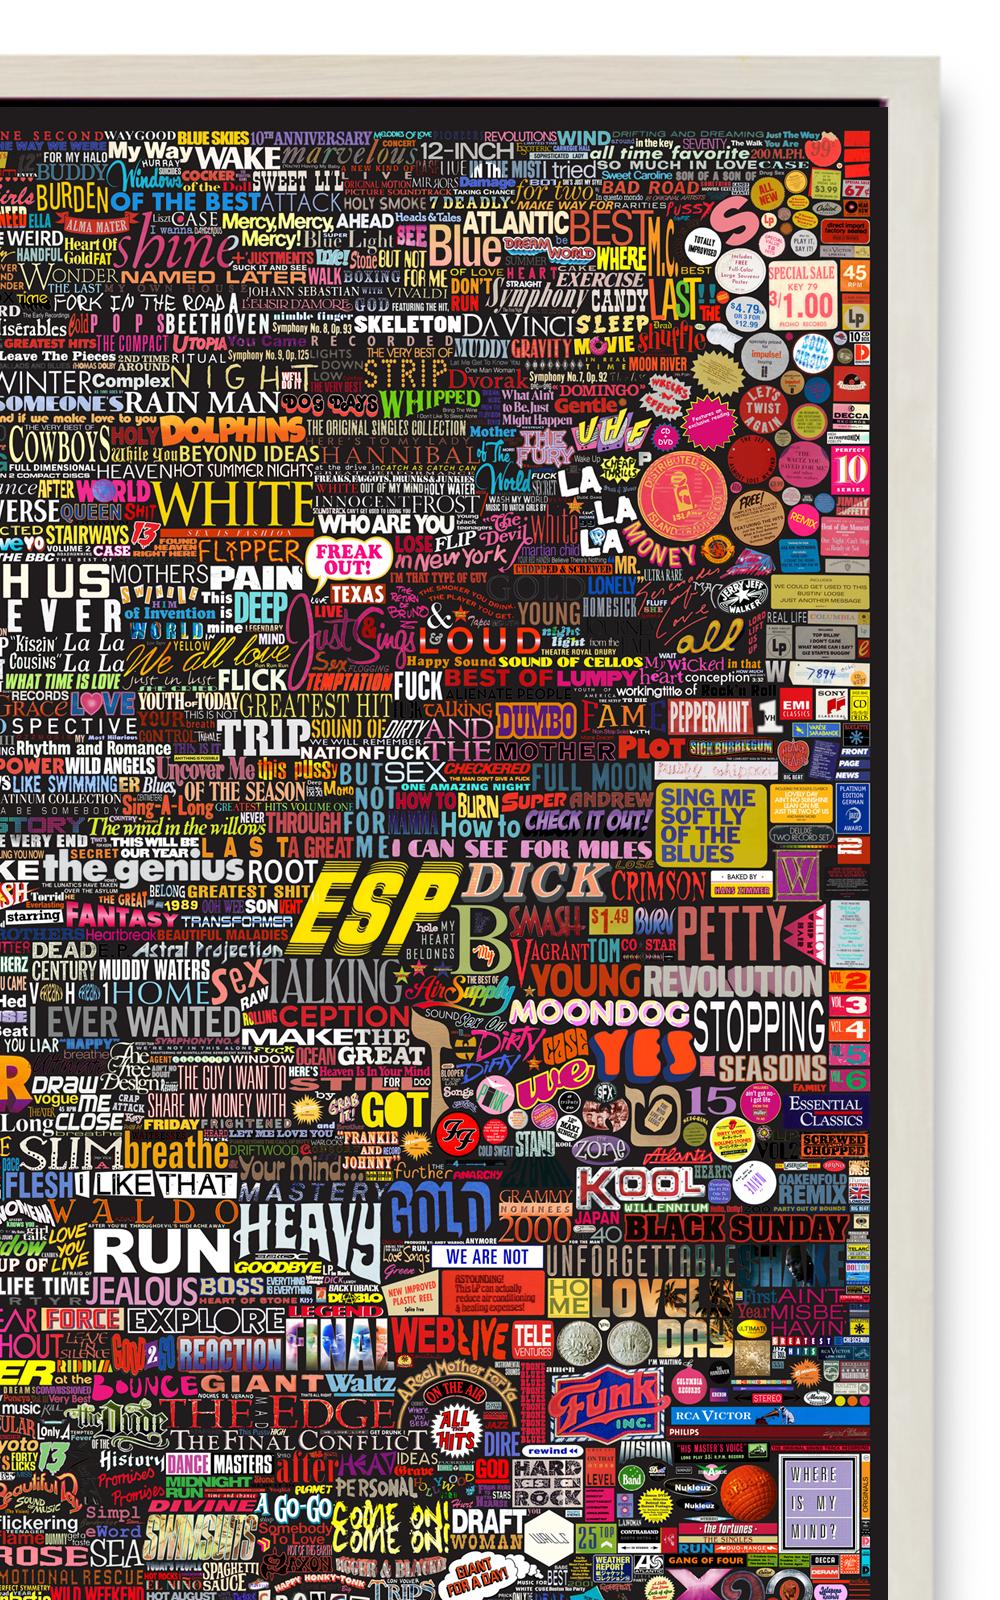 Case Simmons, Simmons & Burke, Album Collection Palette Black, Album Art, Record Cover Collection,C-Print, Digital Collage,Digital Art, Photoshop Collage, Contemporary Collage,Case Simmons Art, Collage Fine Art, Kohn Gallery, Collection Art, Archive Art